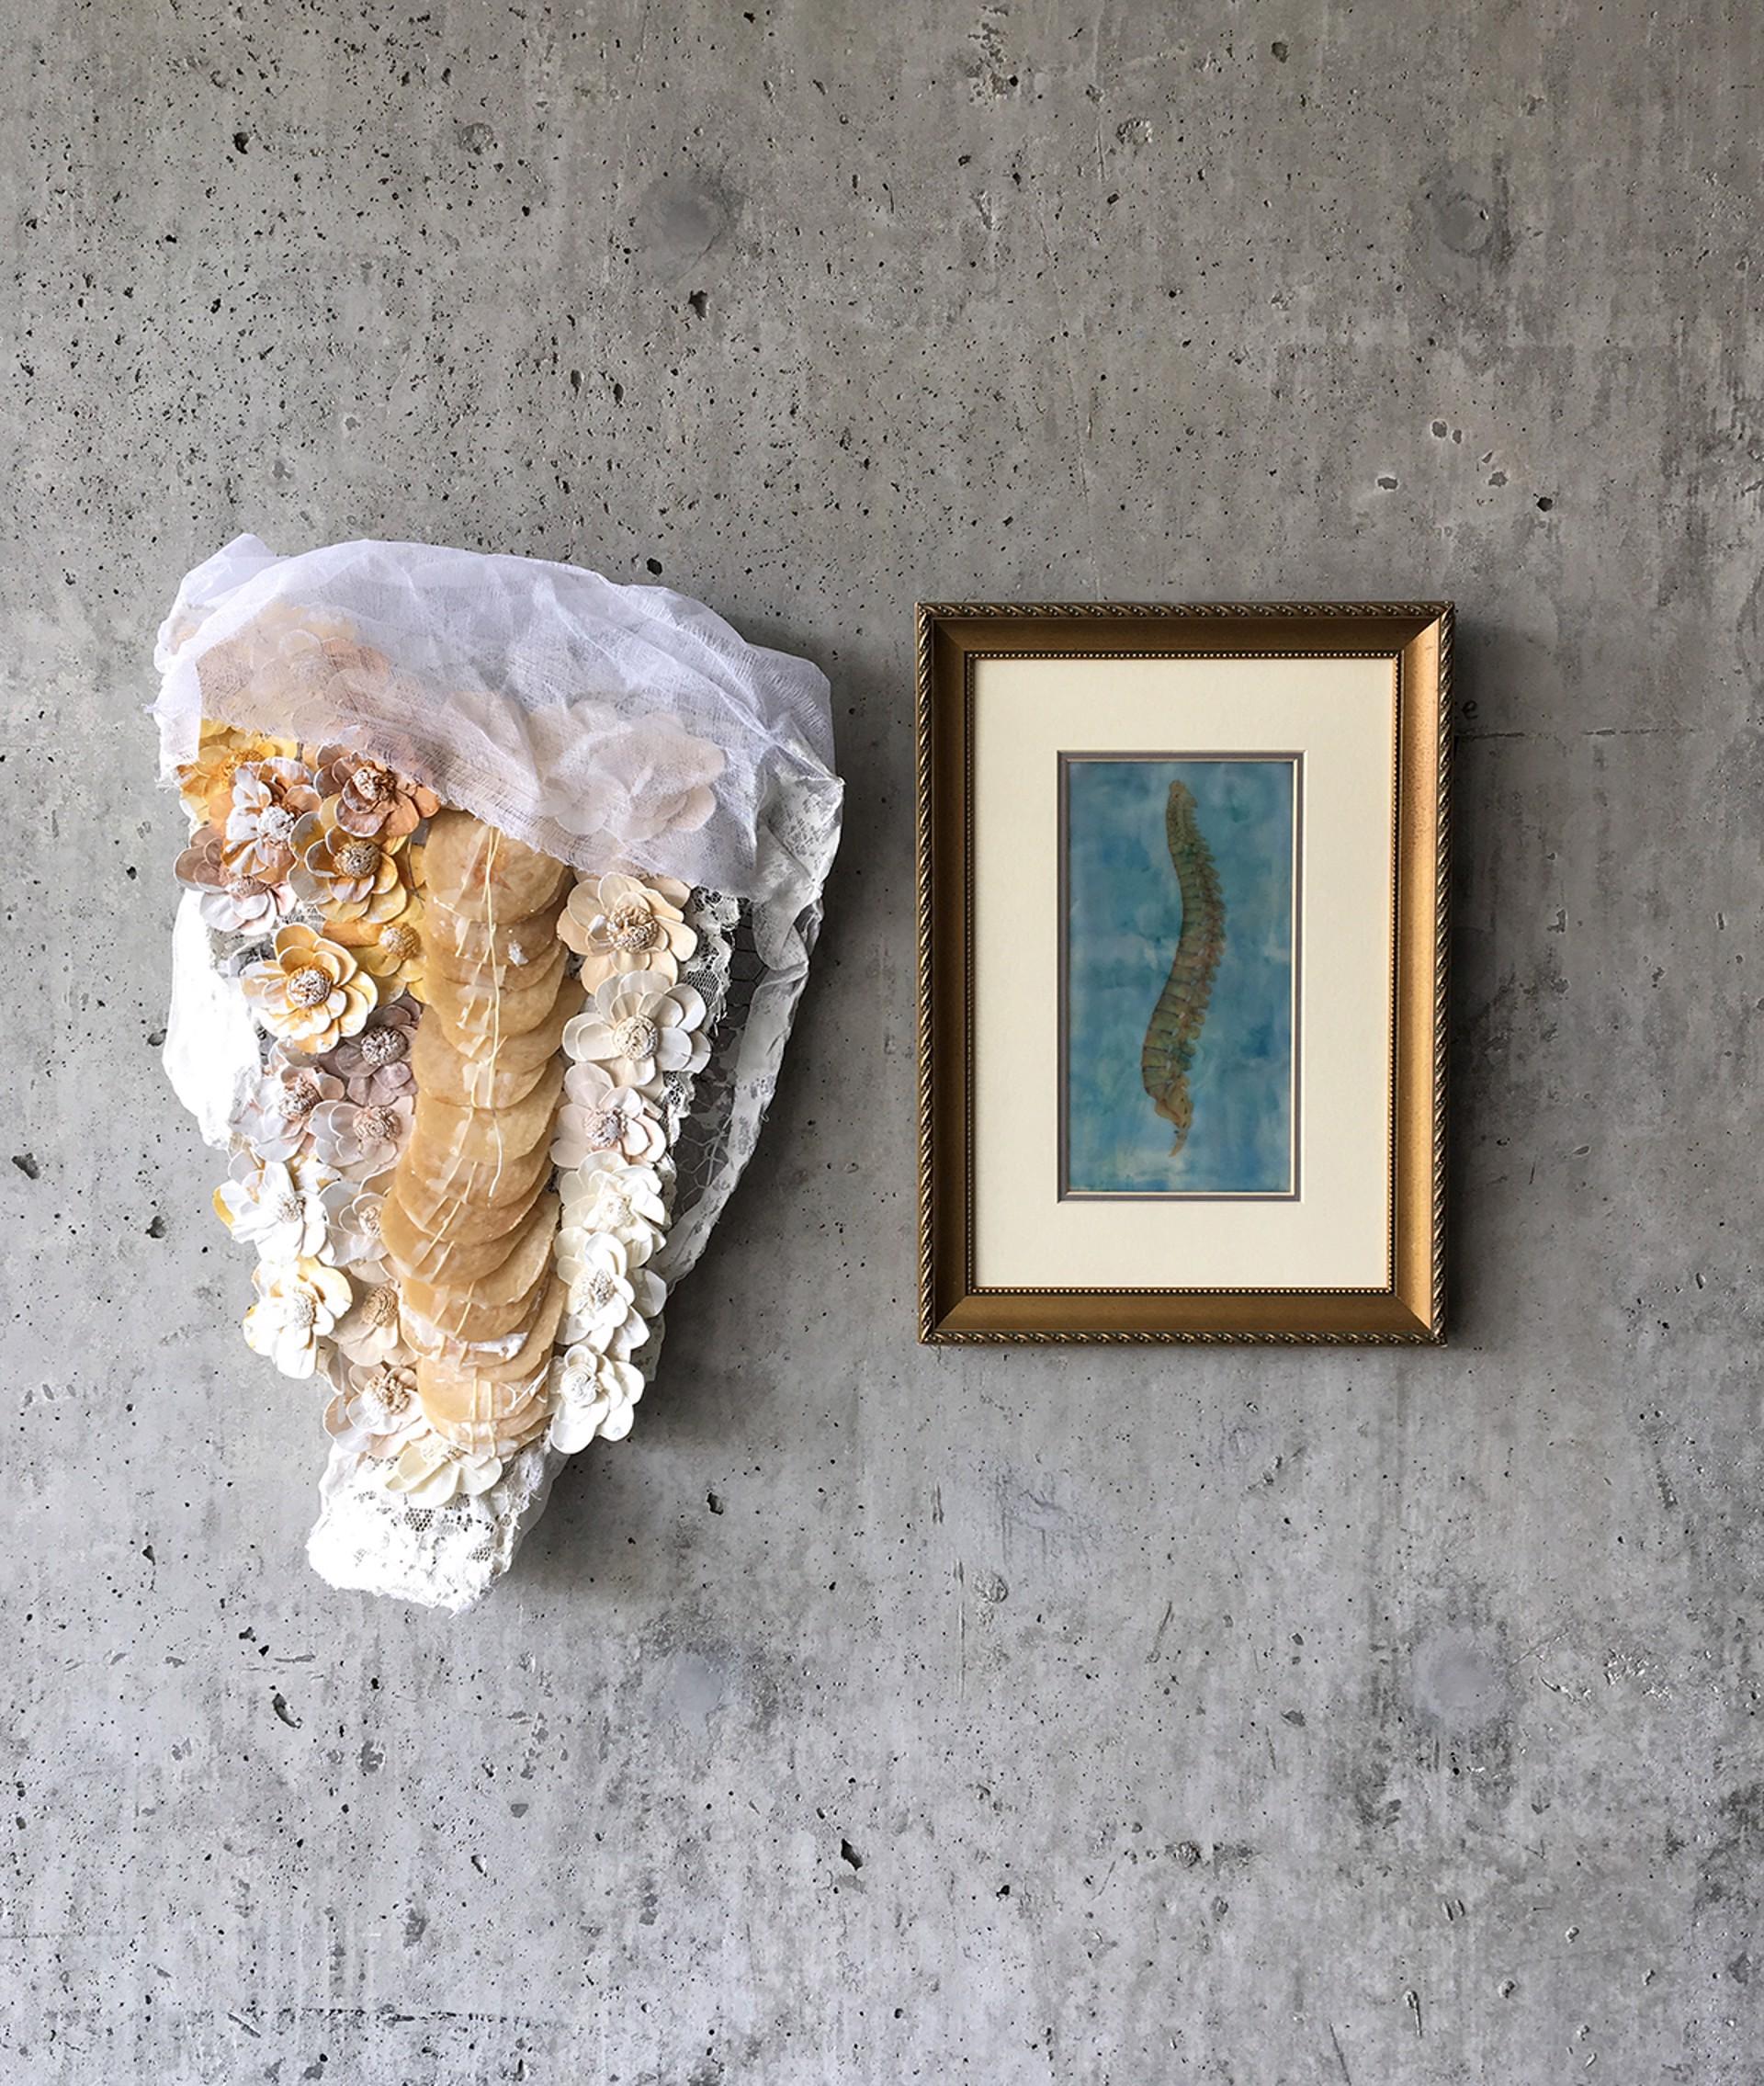 Collapse by Deborah Kapoor